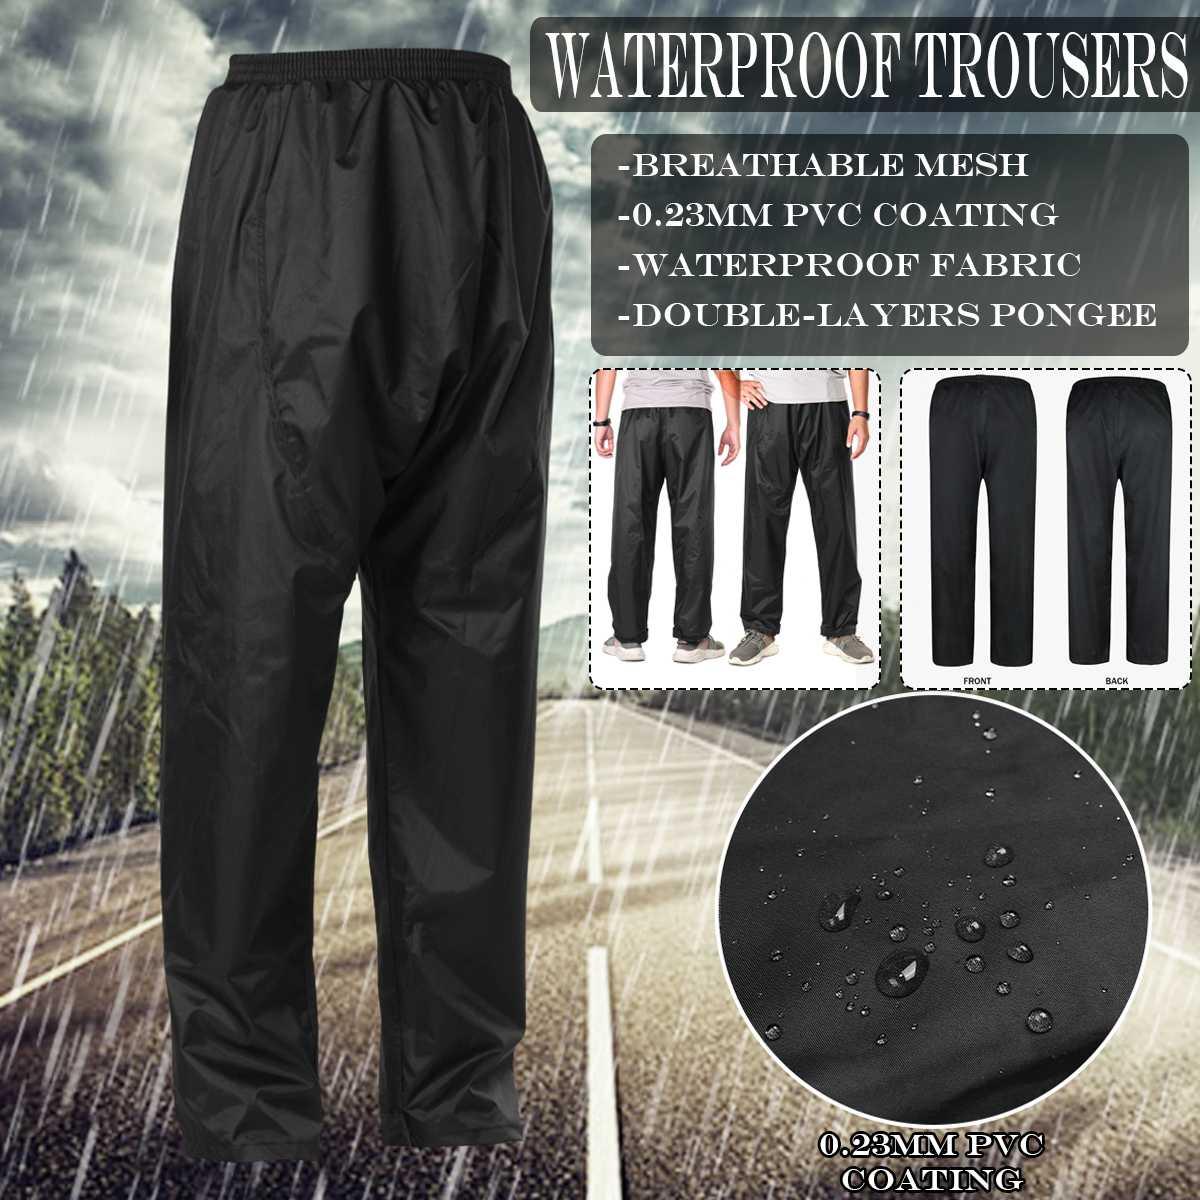 Pantalones impermeables para hombre, mujer, pantalones impermeables, pantalones, pesca, motocicleta, lluvia, ropa al aire libre